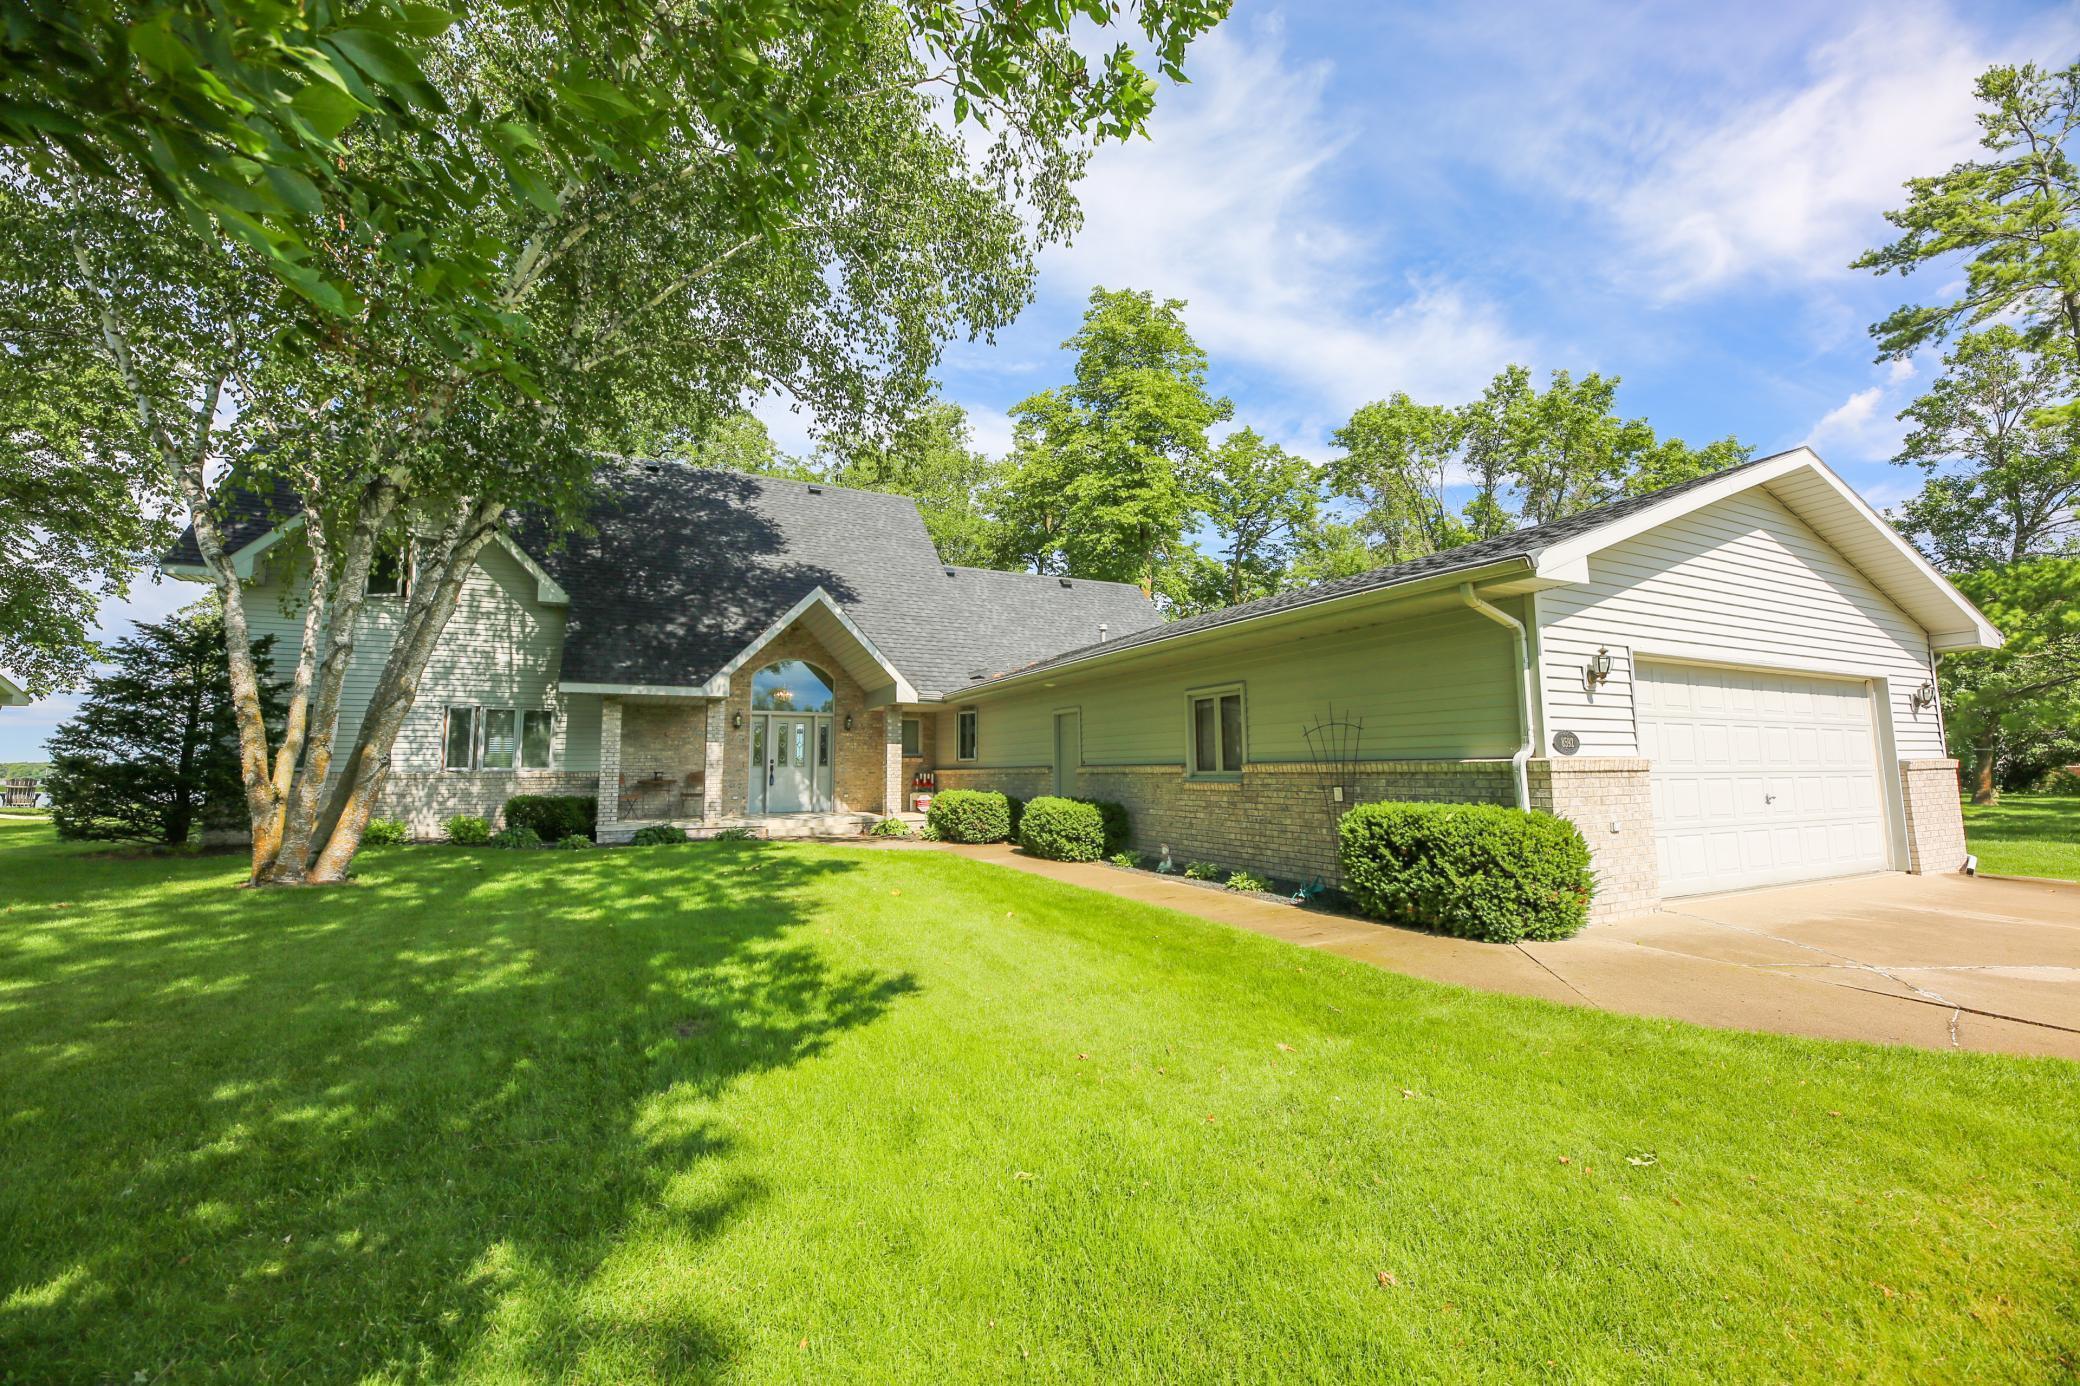 8592 E Lk Carlos Dr NE Property Photo - Carlos, MN real estate listing